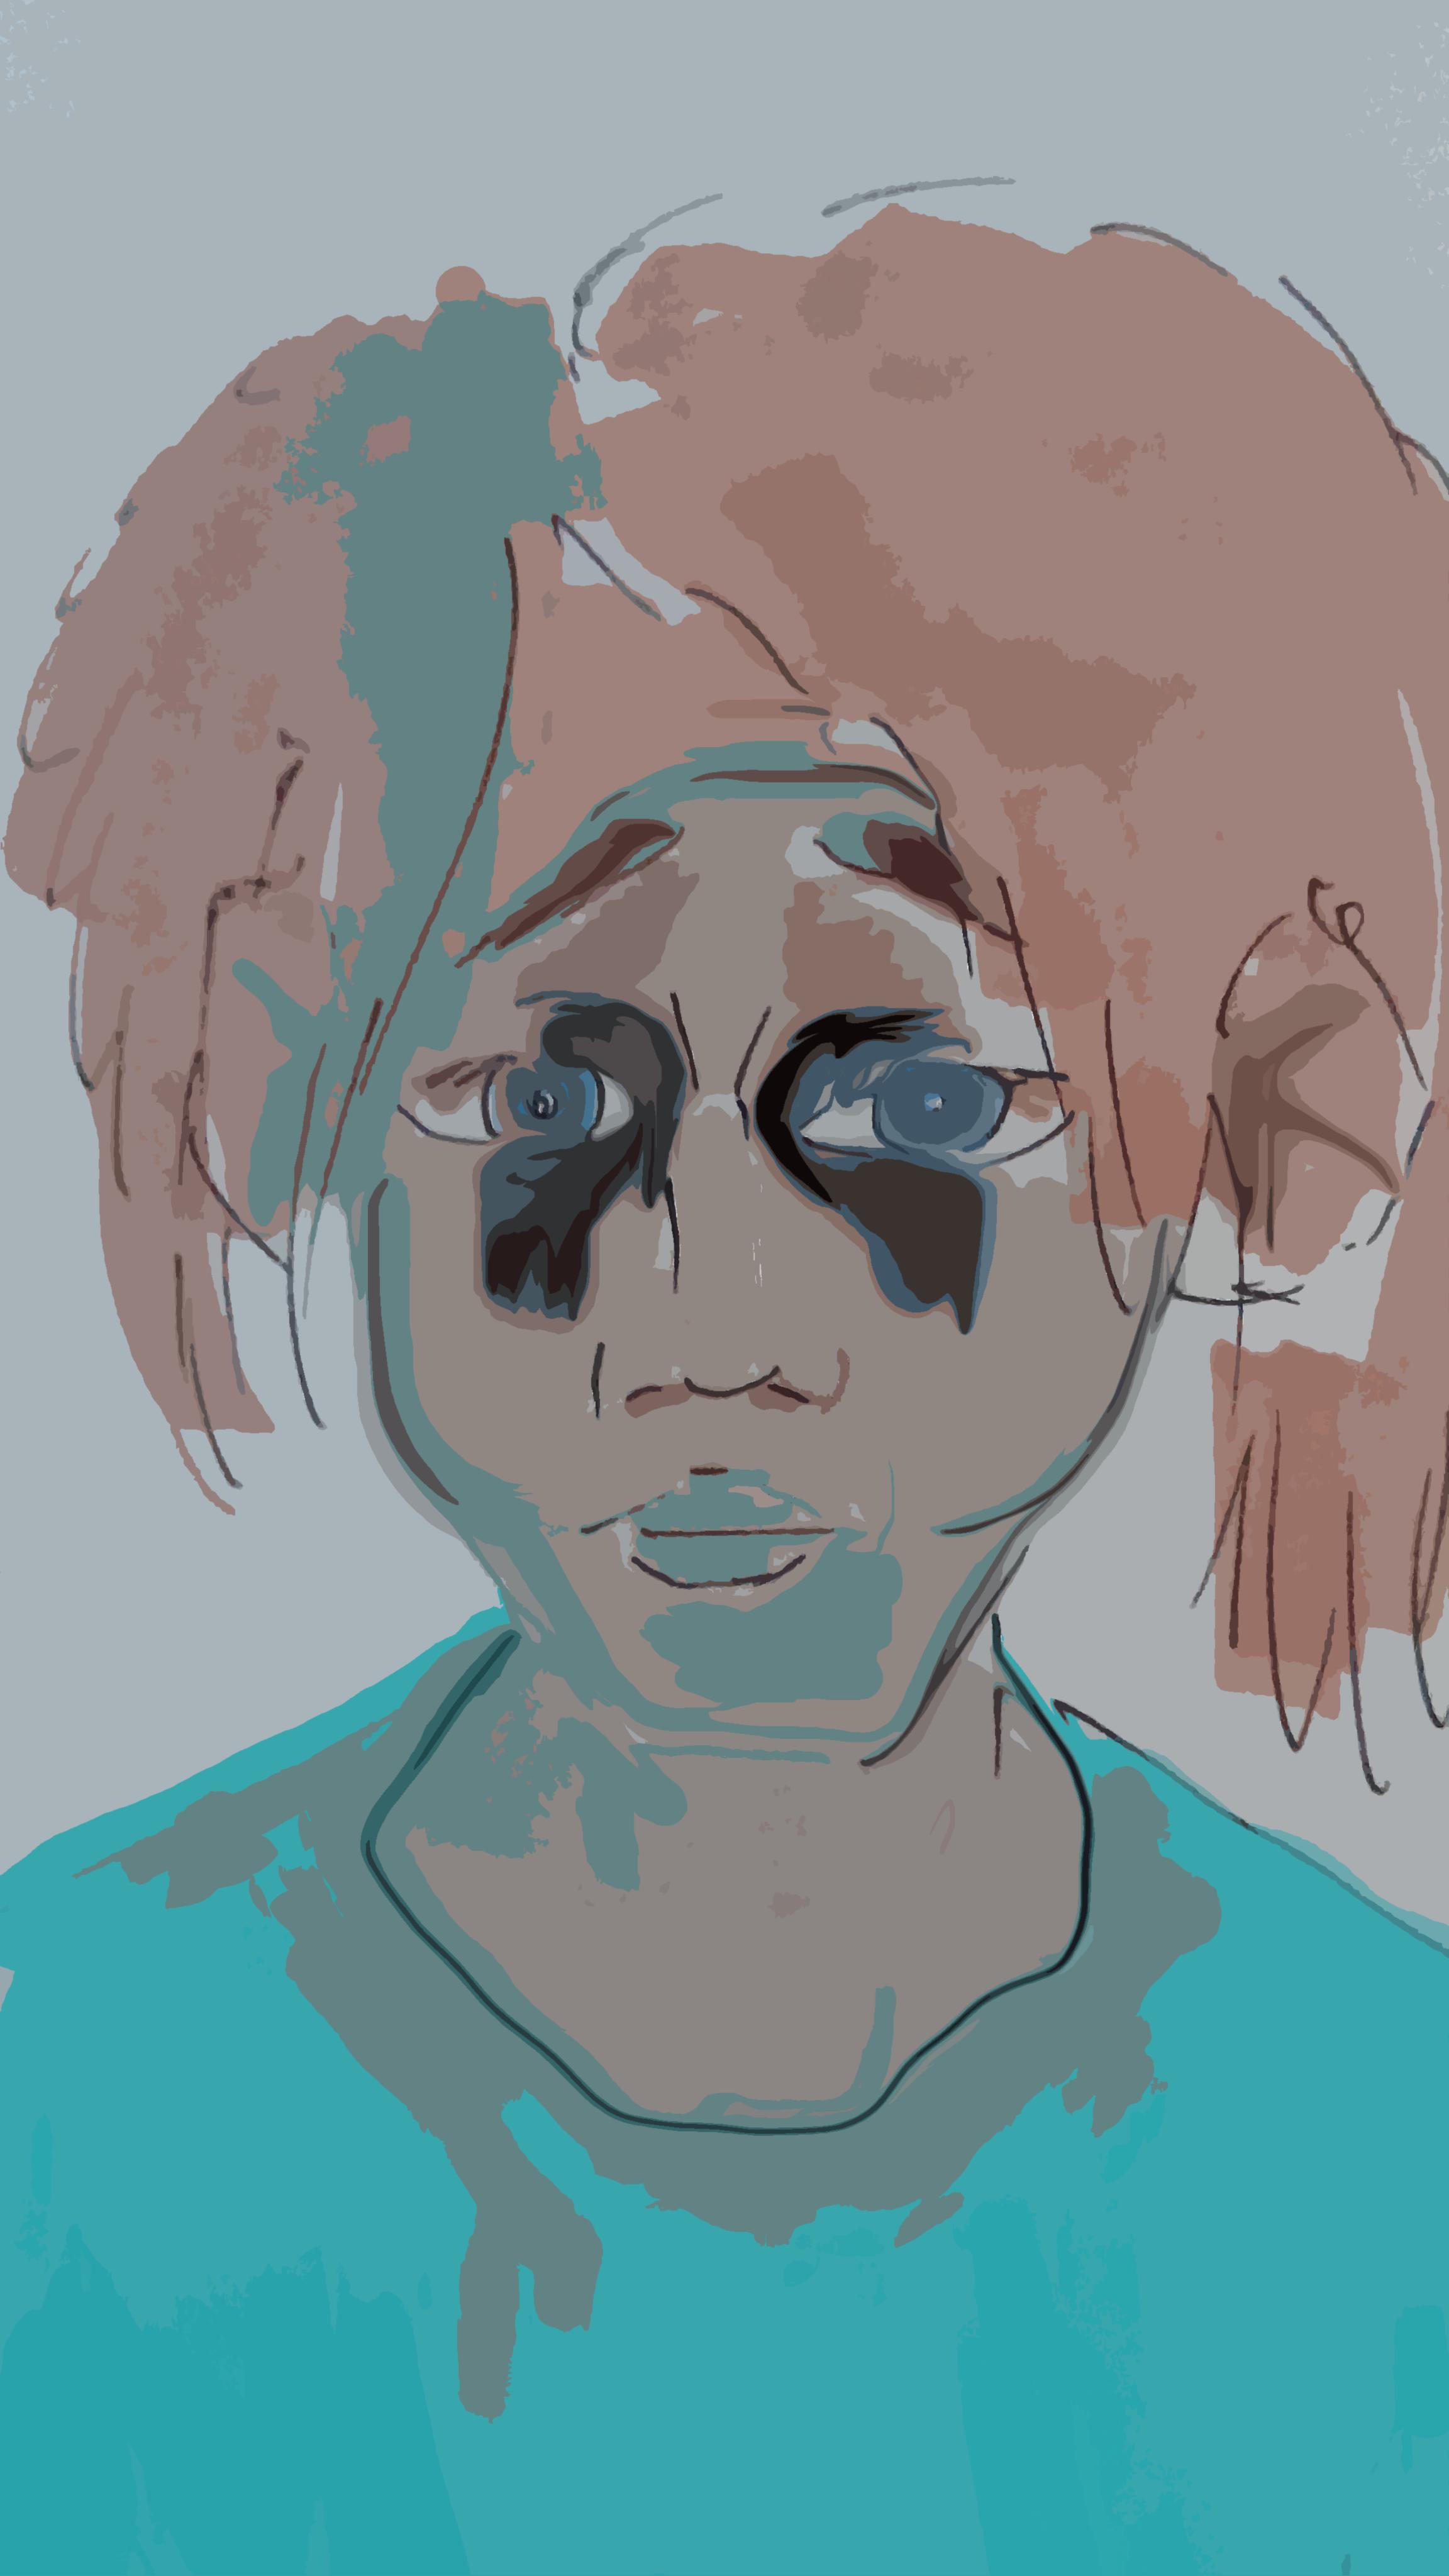 Dessin Tristesse bleutée de Shinji789